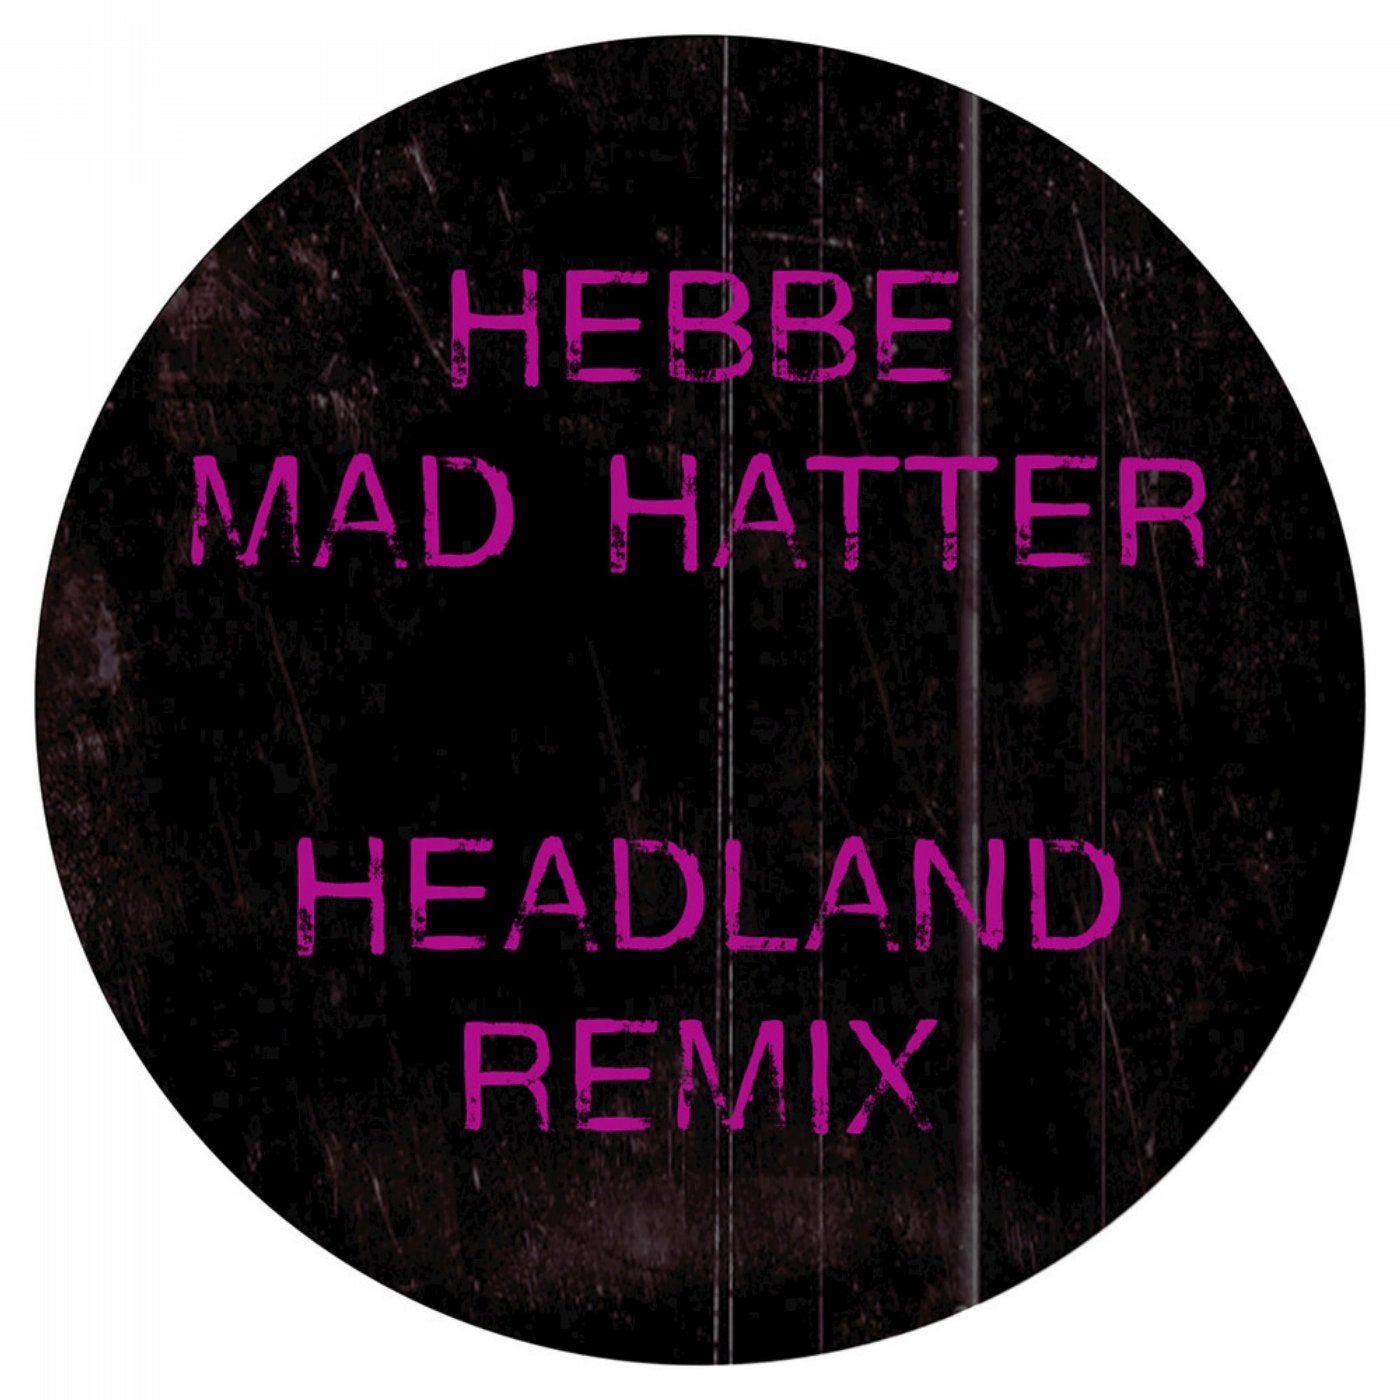 Mad Hatter (Headland Remix)